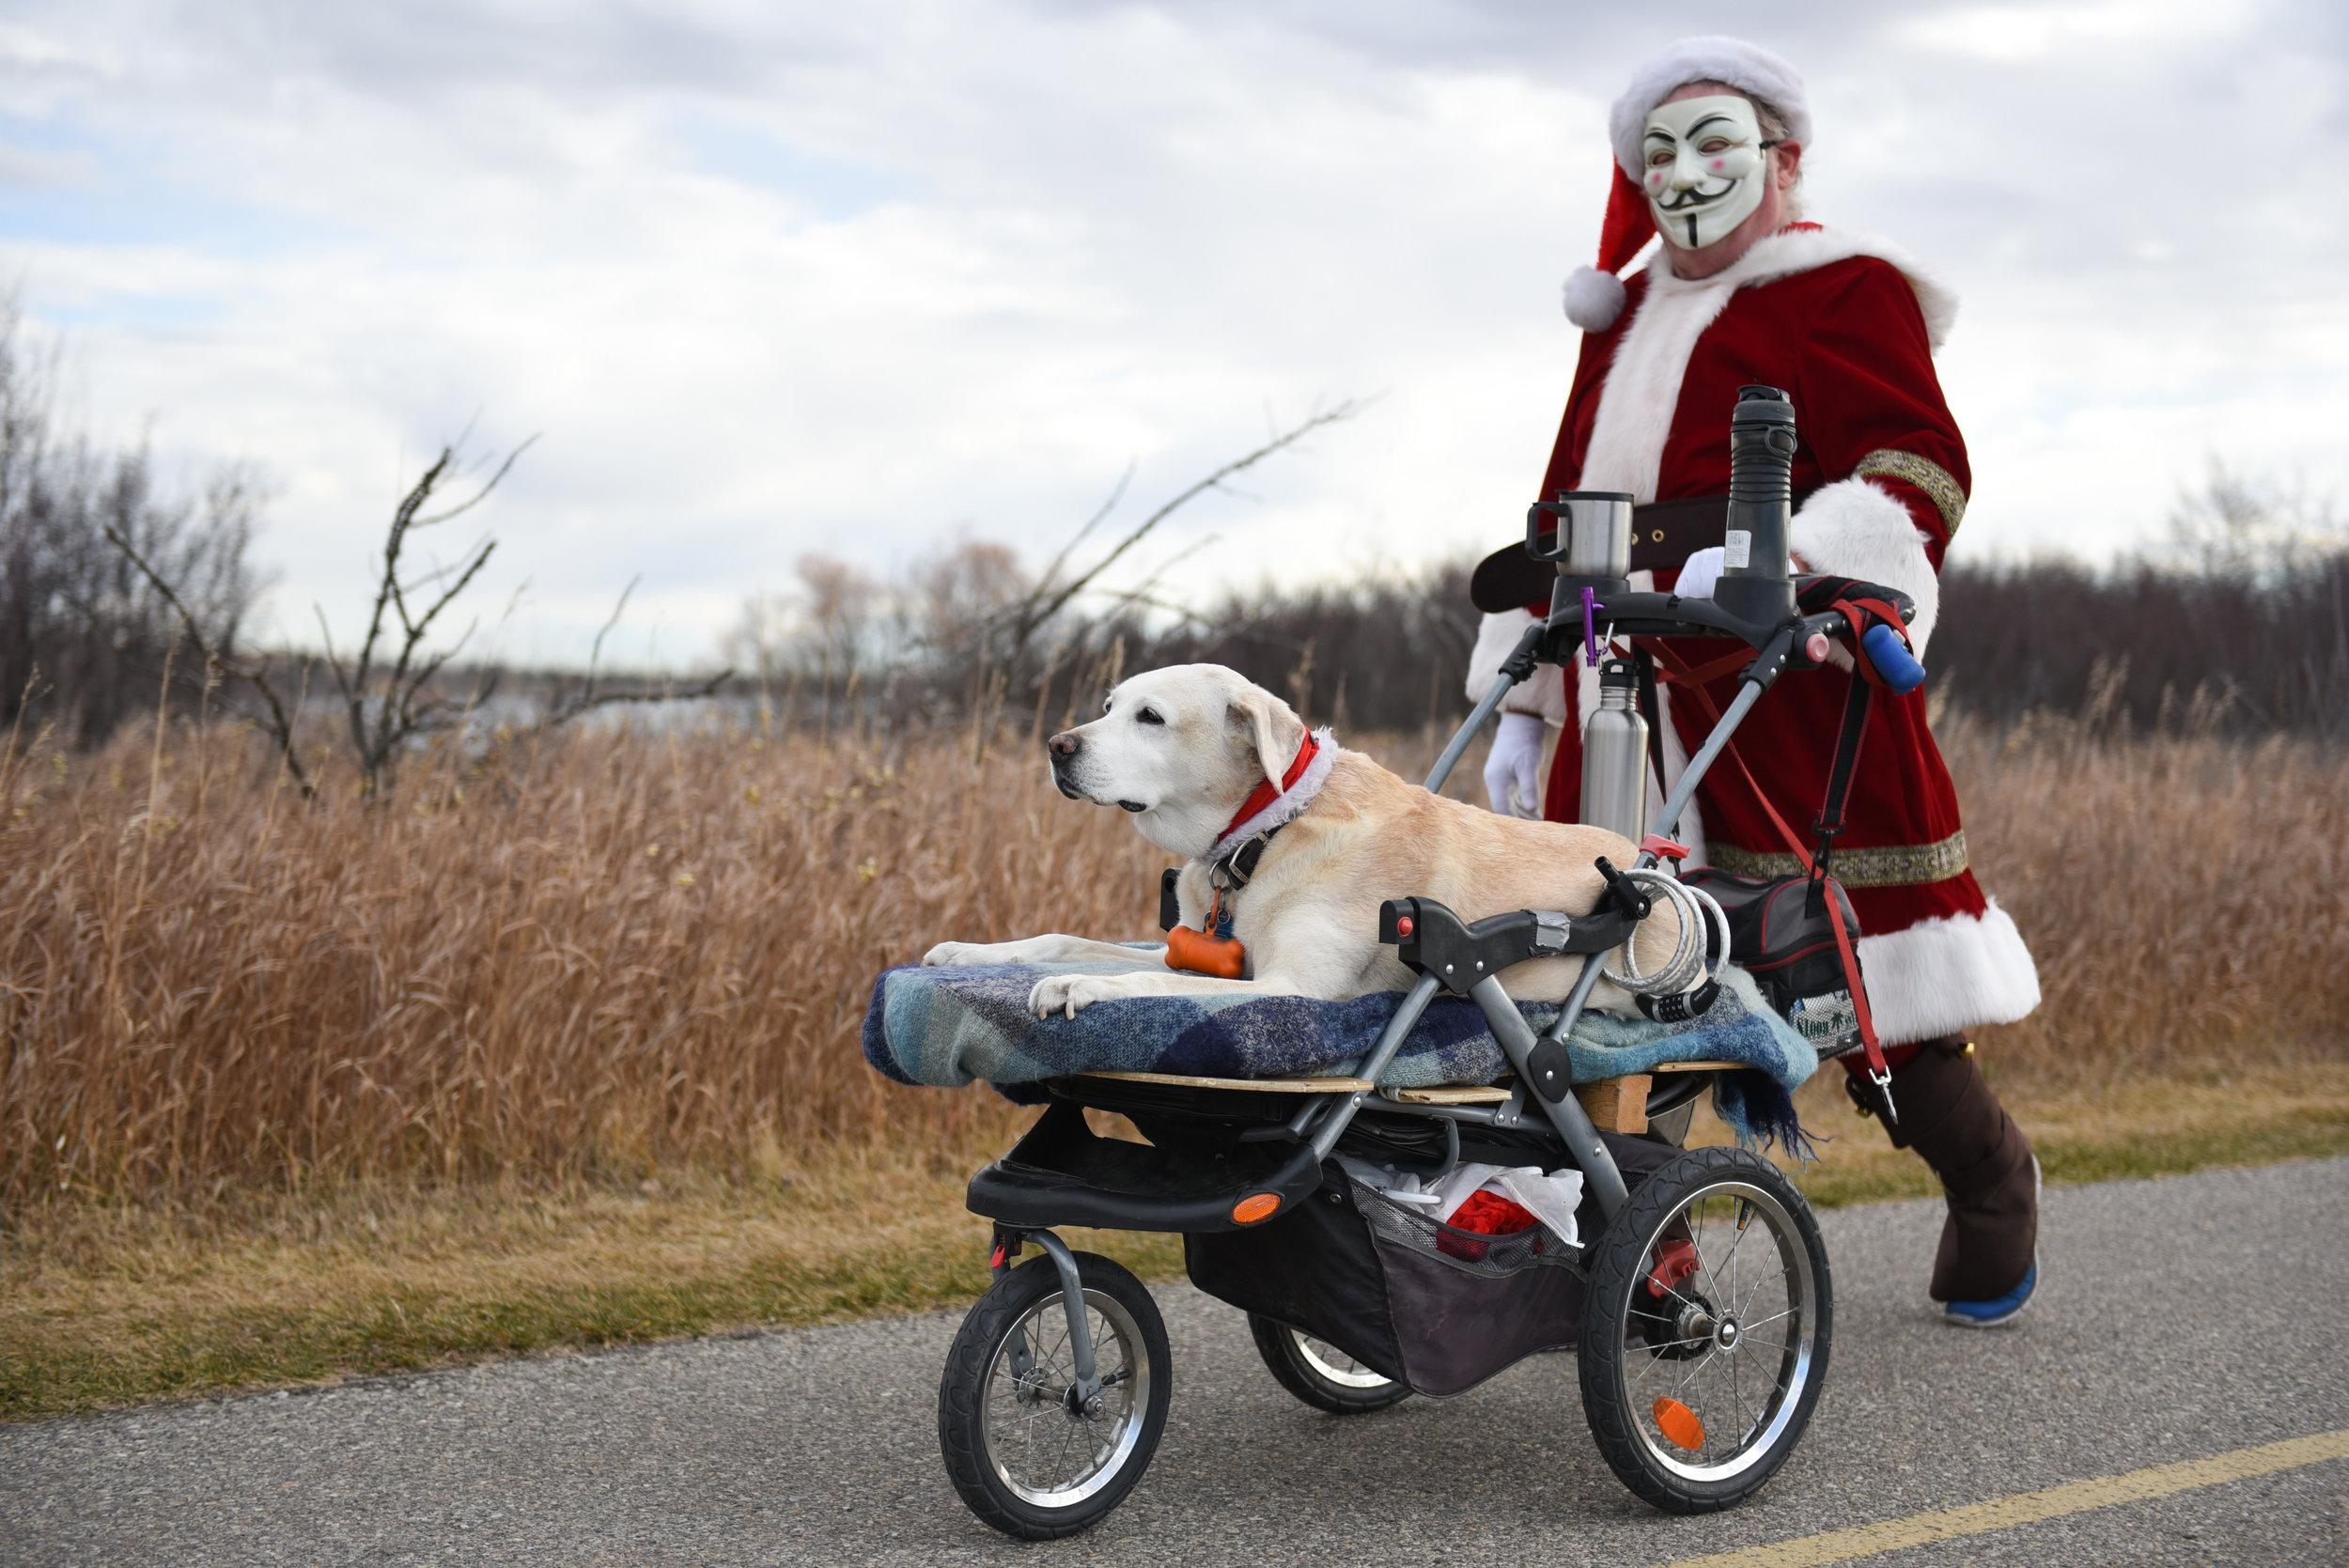 00-20171027 Tails of Help 2017 Howloween Dog Walk SOT 0294.jpg